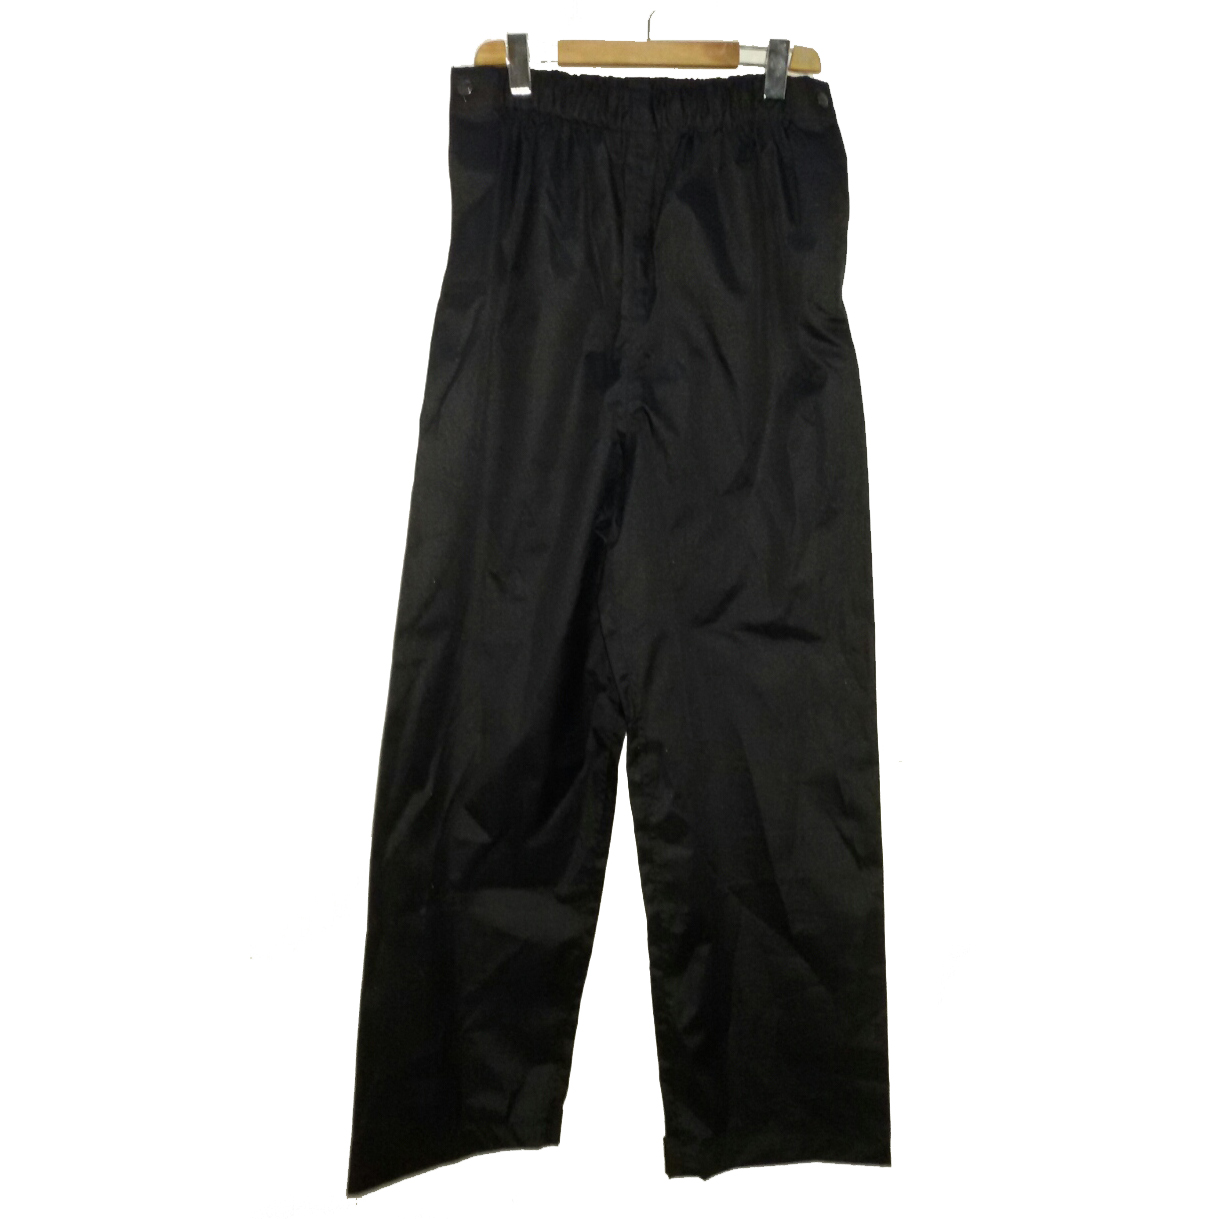 pantalone crne